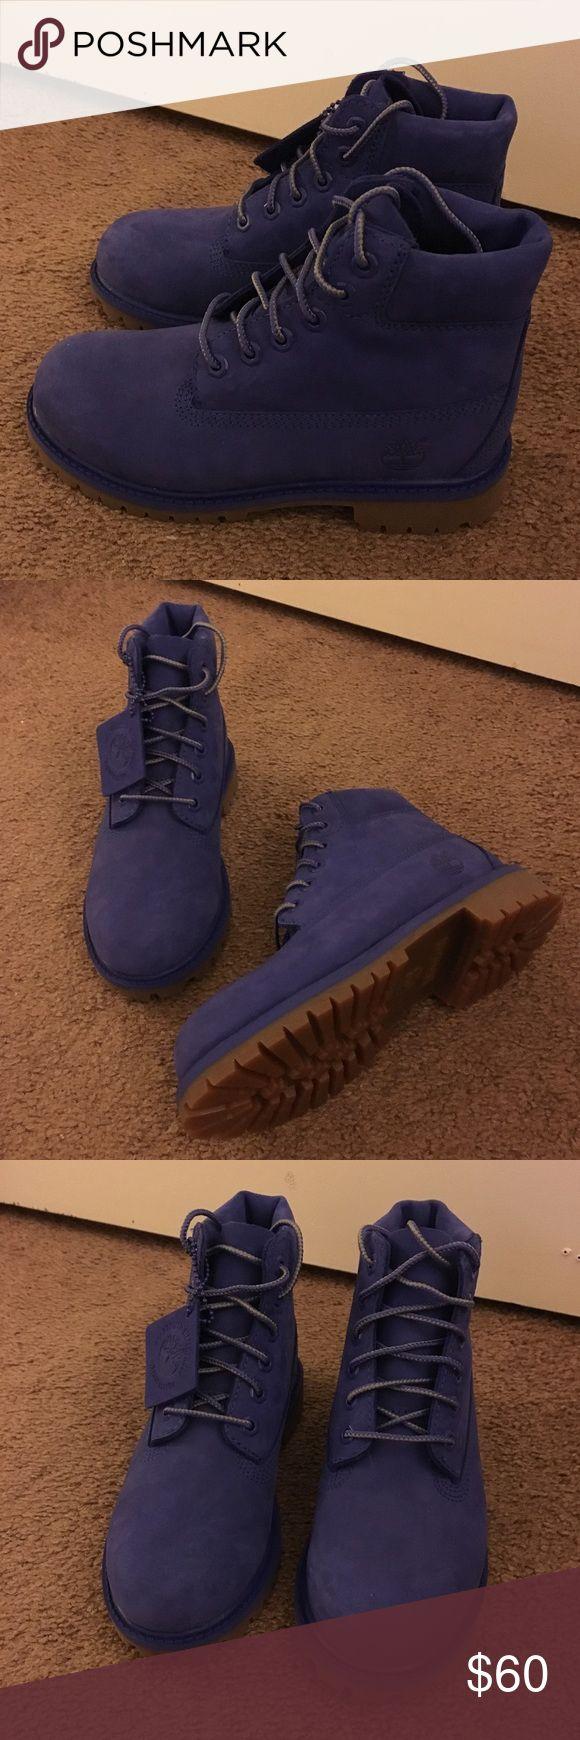 "New TIMBERLAND 6"" PREMIUM WATERPROOF BOOTS  Kids 1 Brand New TIMBERLAND Kids 6"" PREMIUM WATERPROOF BOOTS / Kids Size 1 Timberland Shoes Boots"